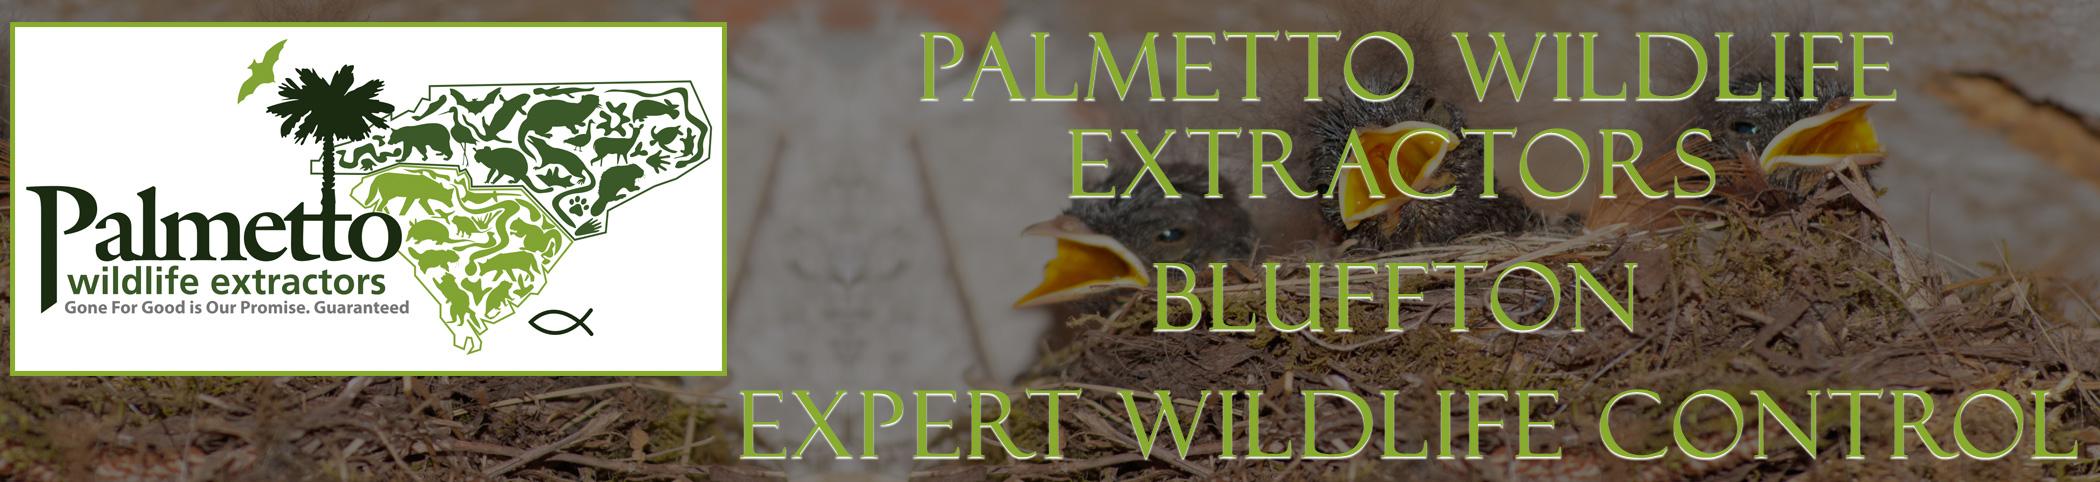 Palmetto Wildlife Extractors Bluffton south carolina header image